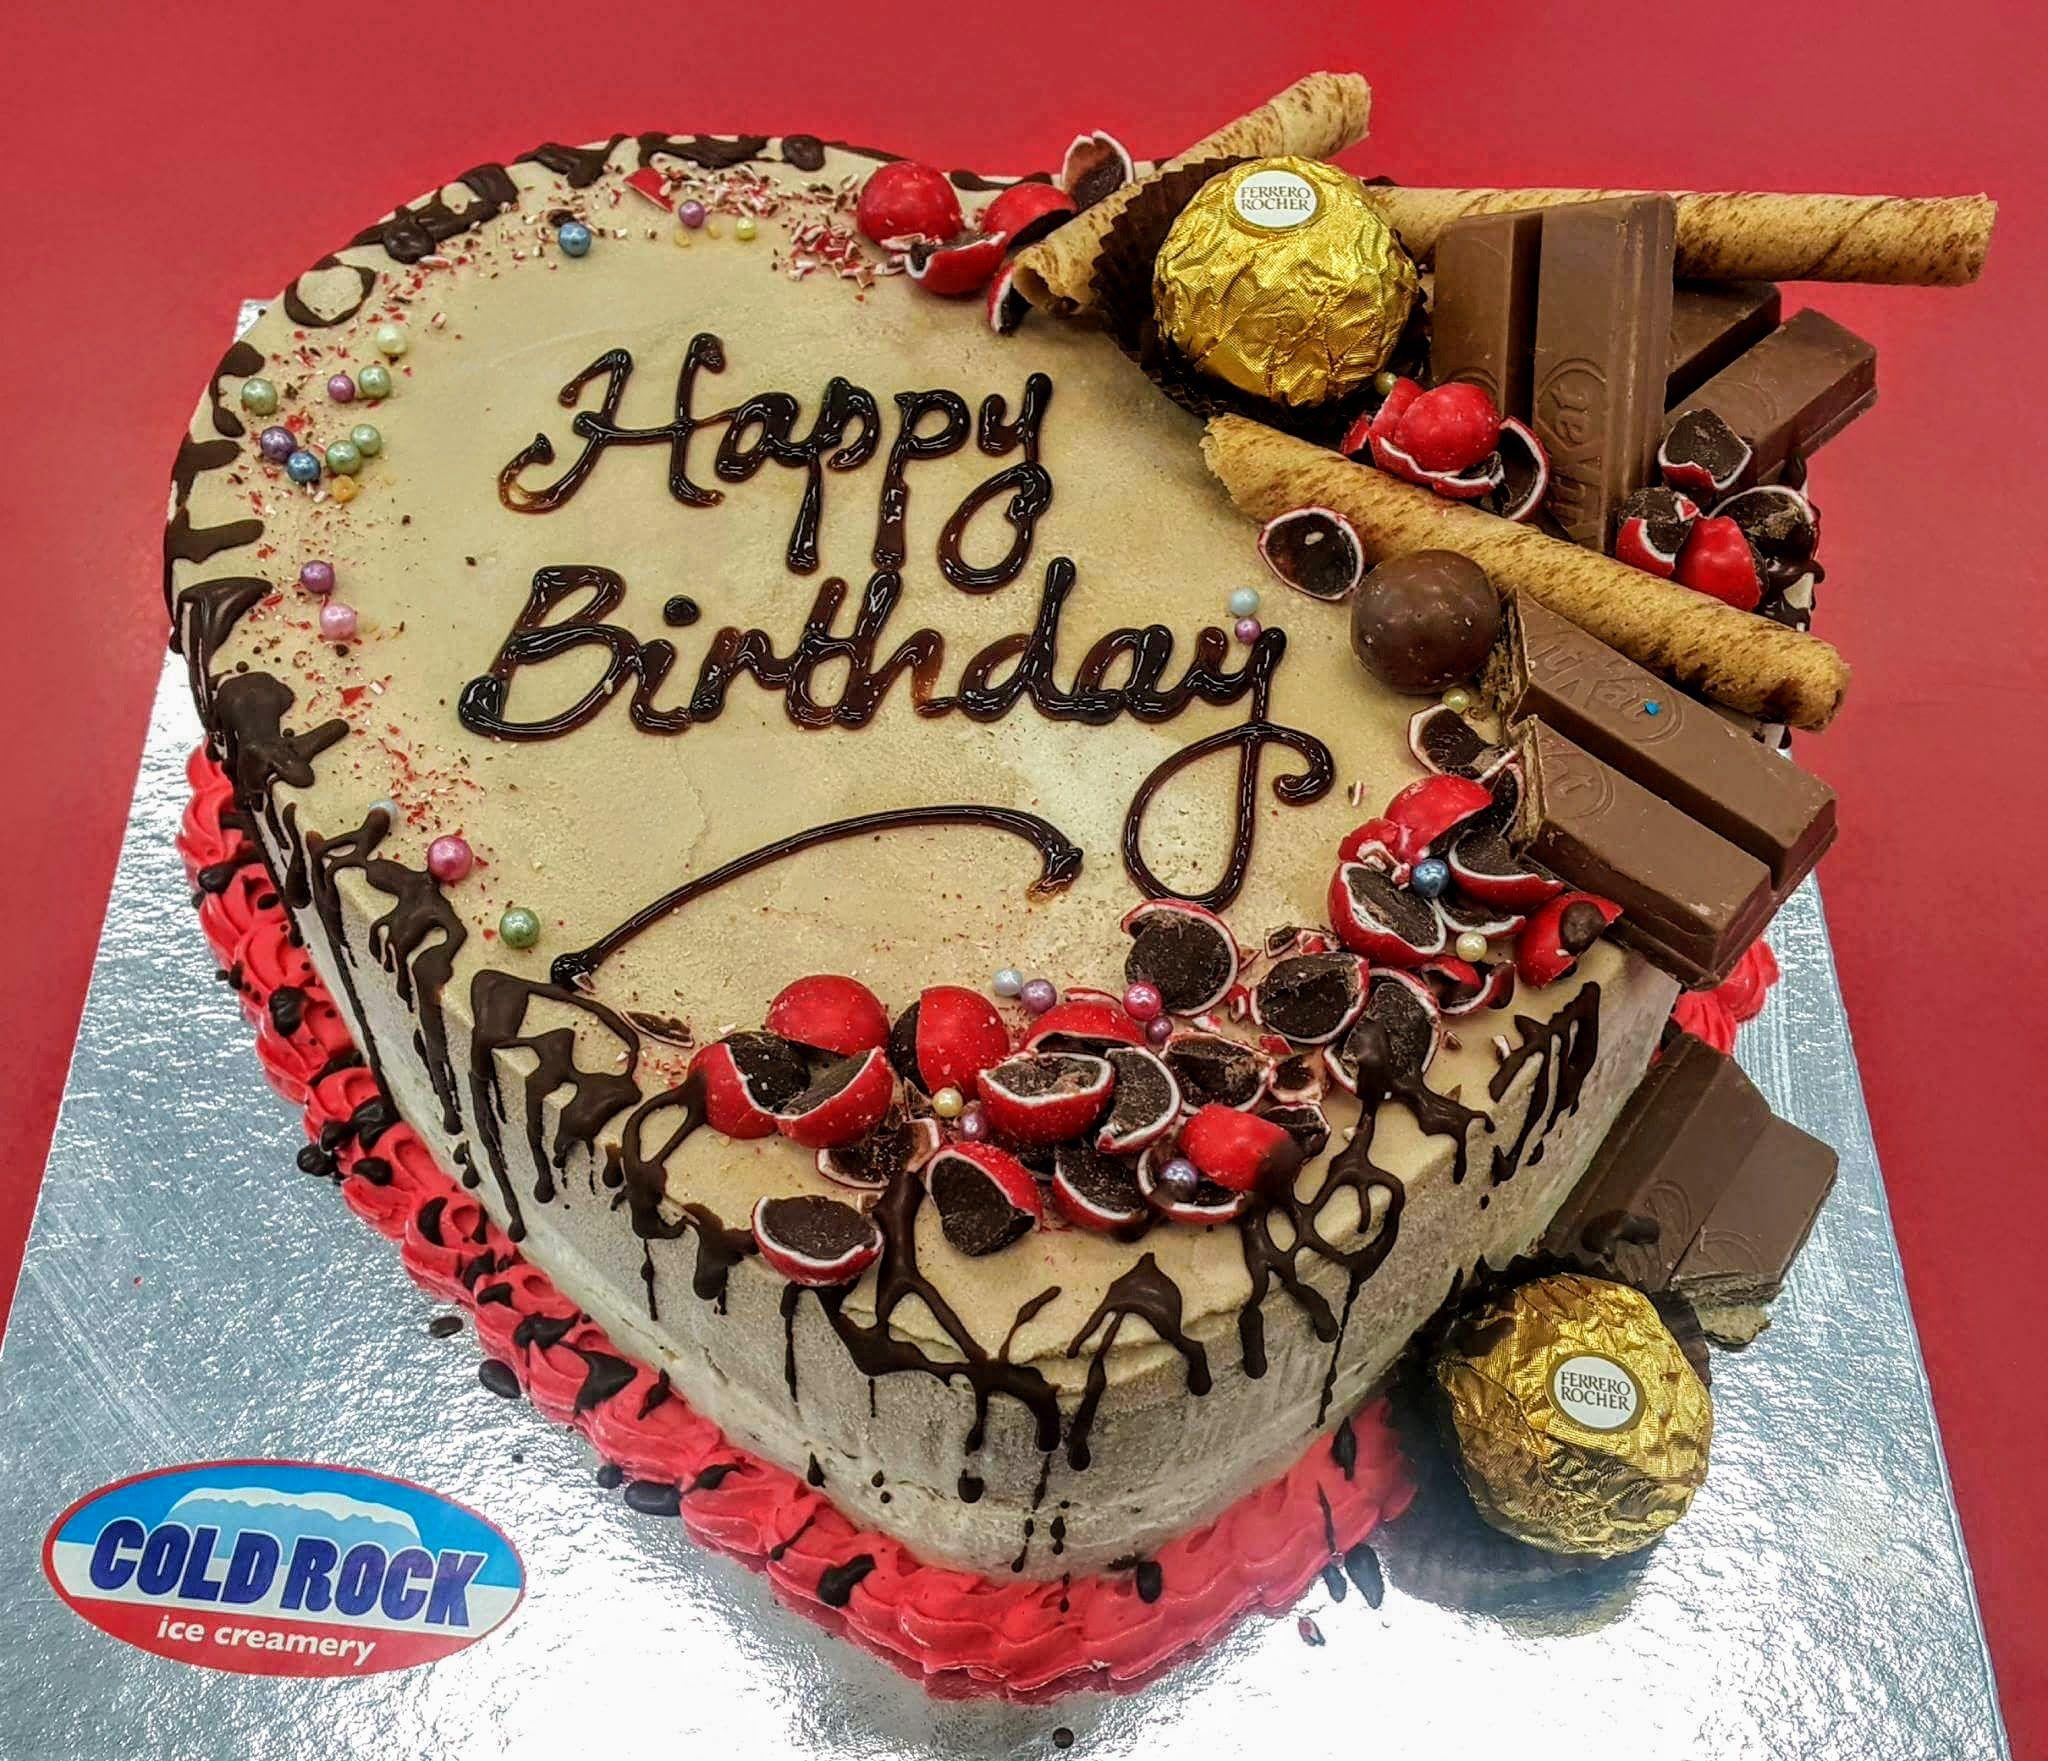 Happy Birthday Love Happy Birthday Cakes Birthday Cake With Flowers Happy Birthday Cake Images